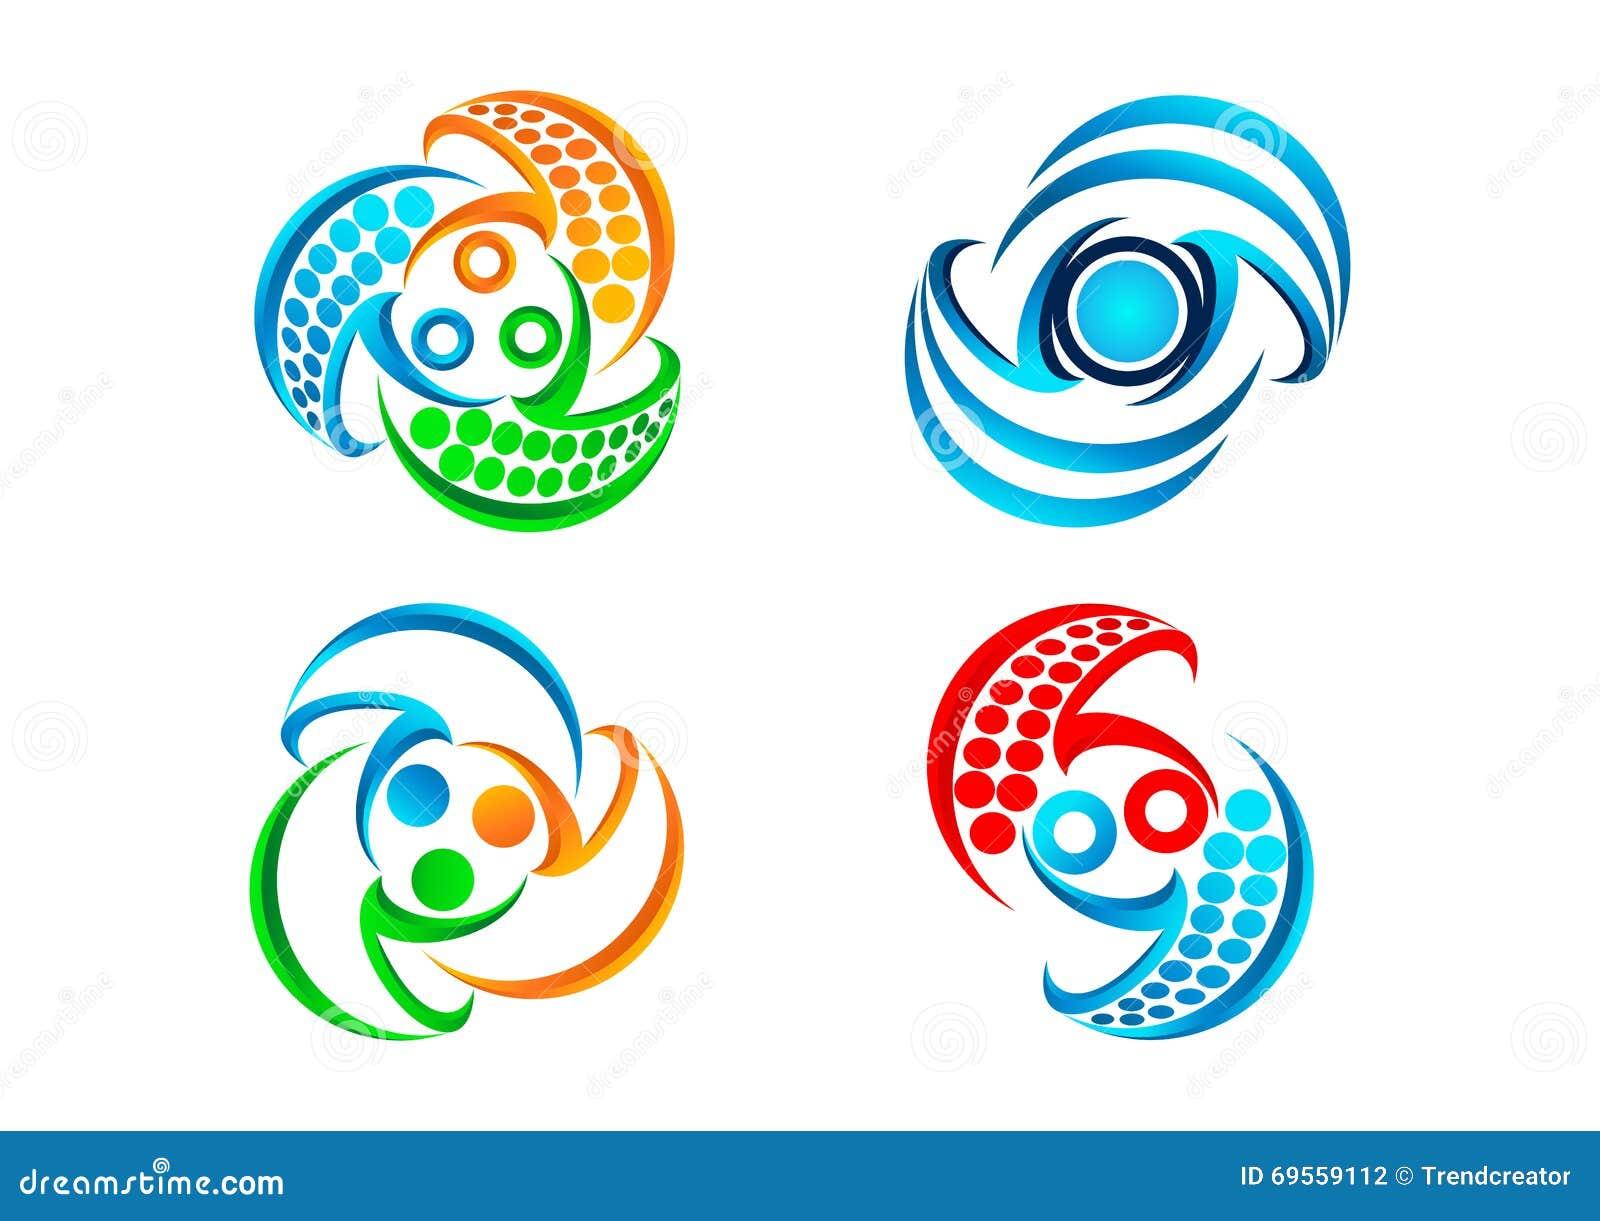 Connection logo,balance communication icon, modern technology symbol and teamwork concept design